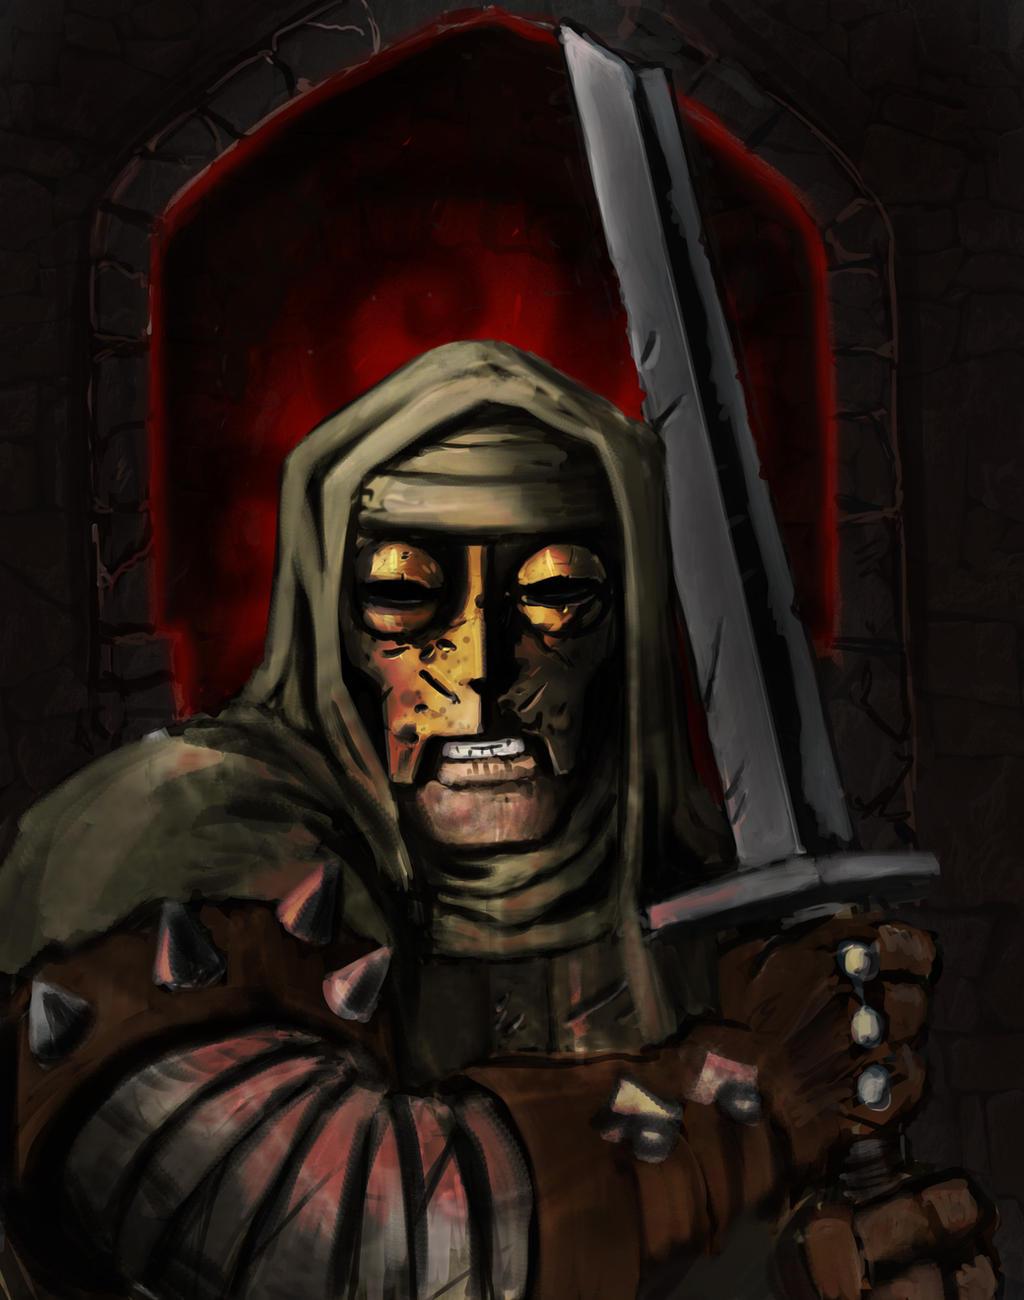 ⚔ SPIRIT BRINGERS:  EL GRAN ASALTO A BEAGALLTACH  ⚔  - Página 4 Darkest_dungeon_by_andgil-d8kv4dk